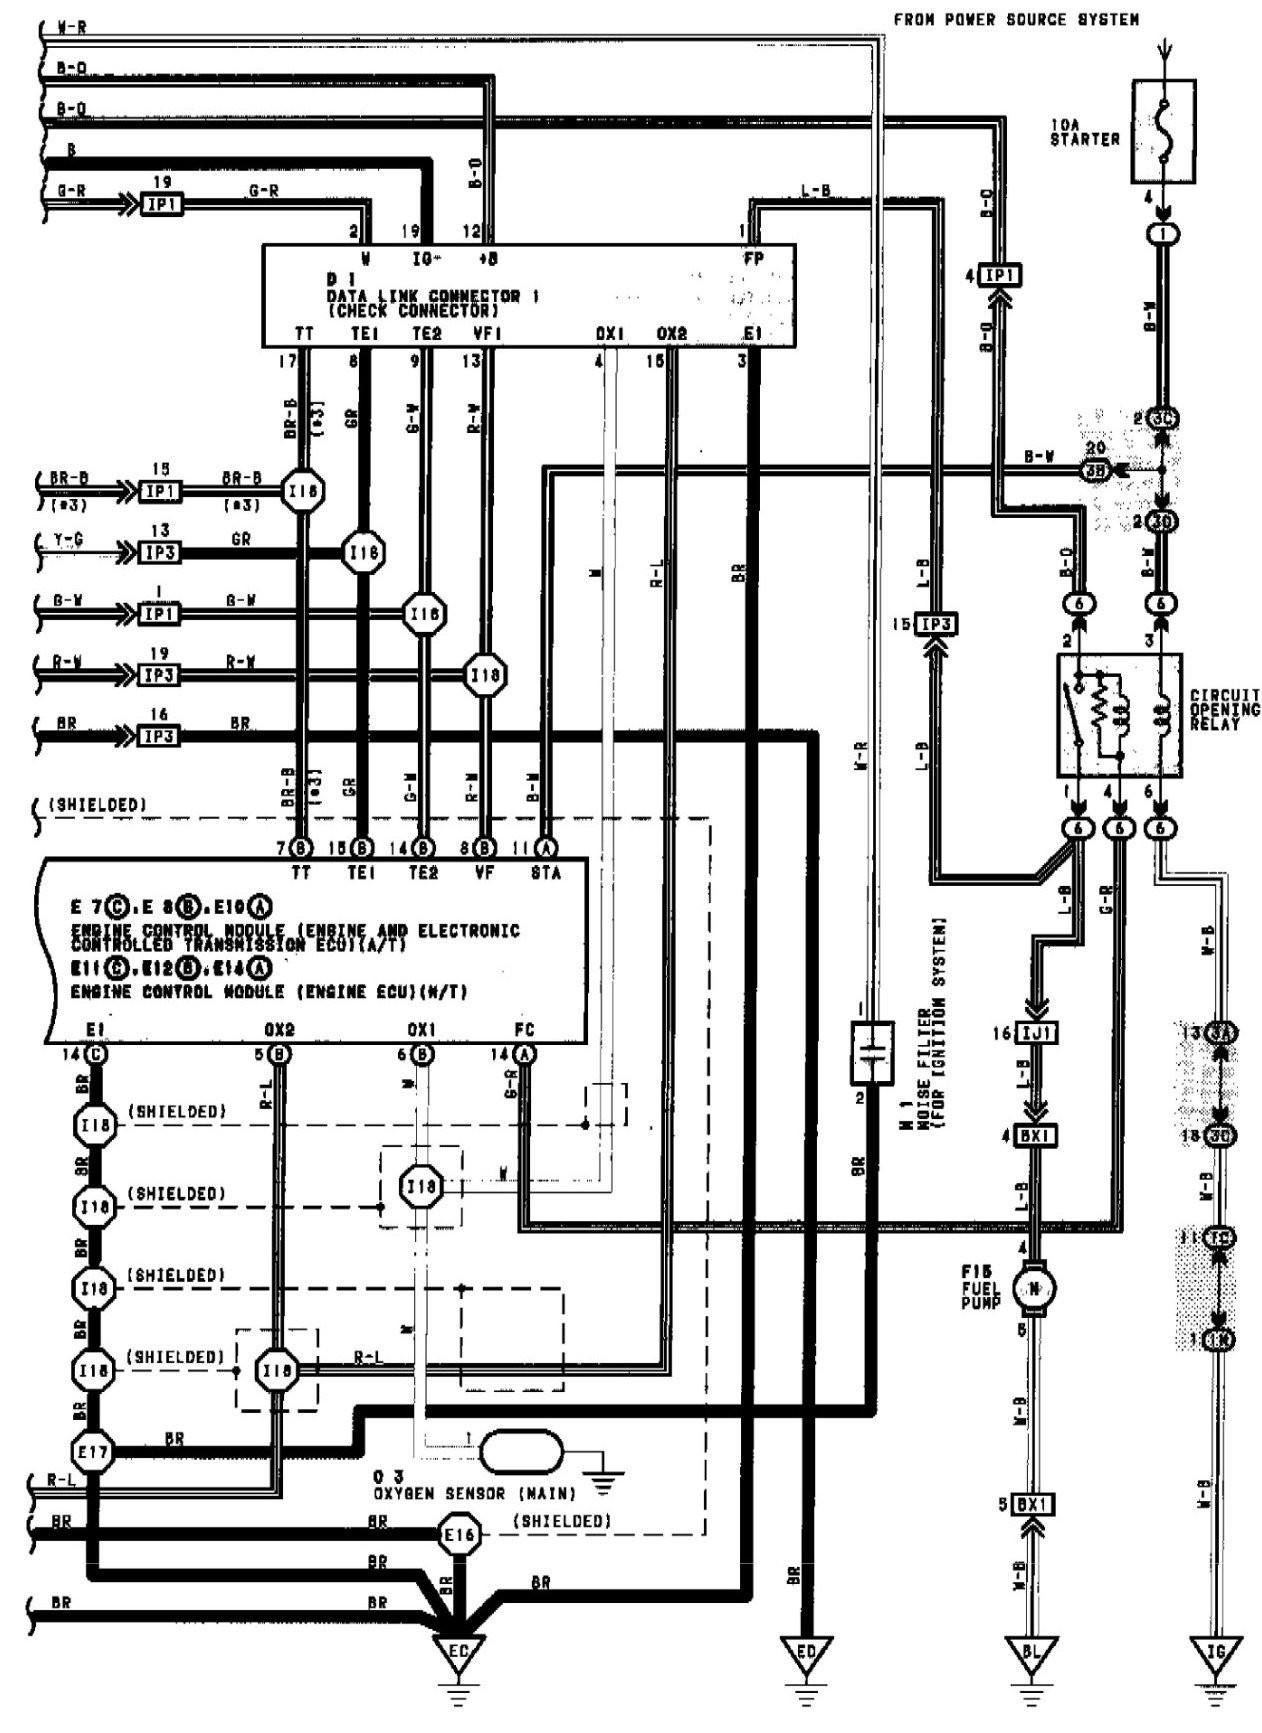 2011 toyota camry wiring diagram